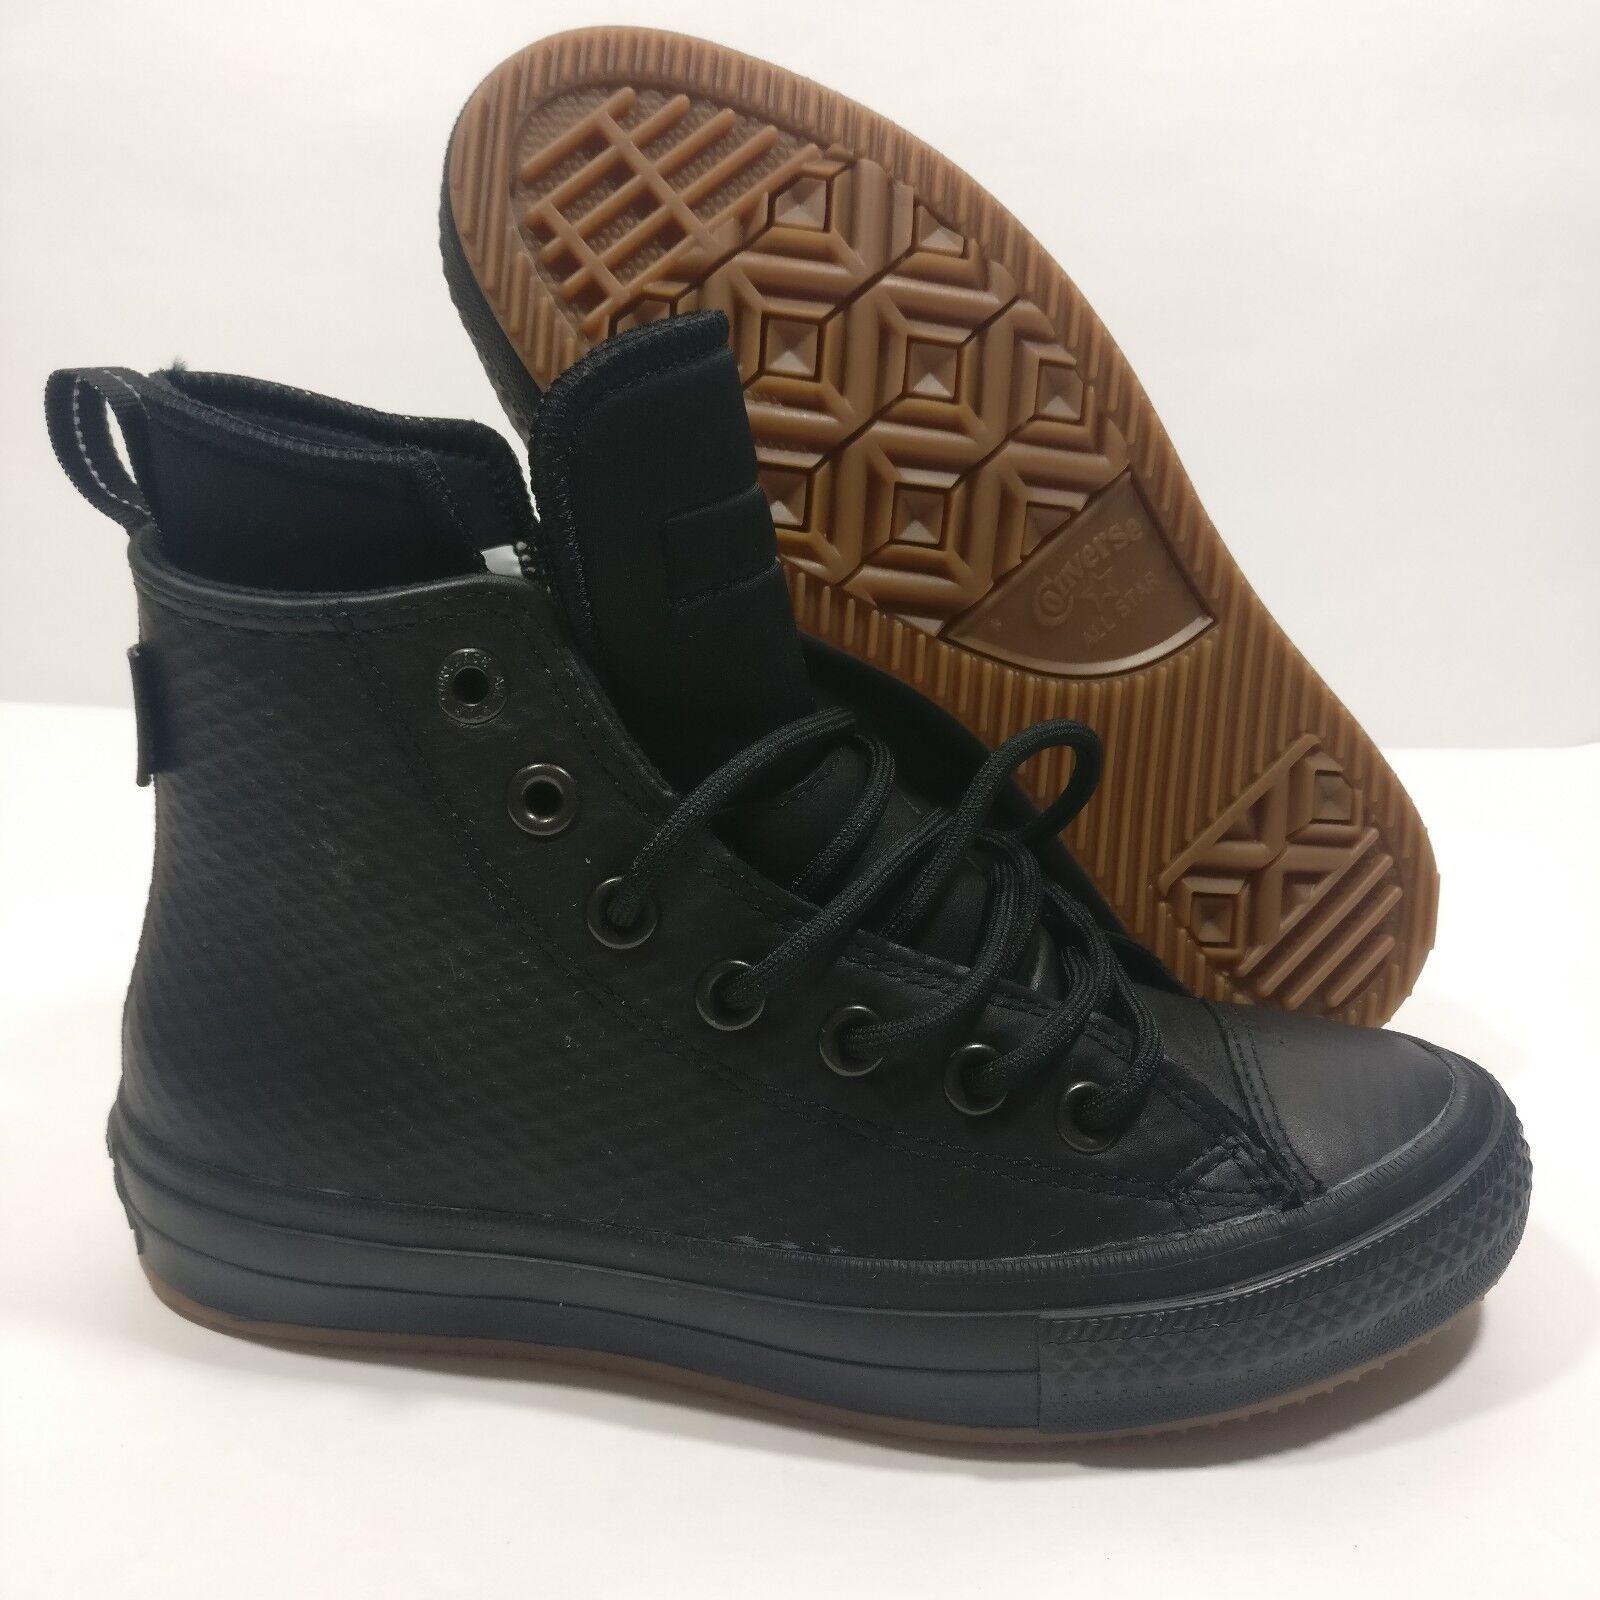 Converse Chuck Taylor All Star II Boot HI Waterproof Black (153571C) Multi Size